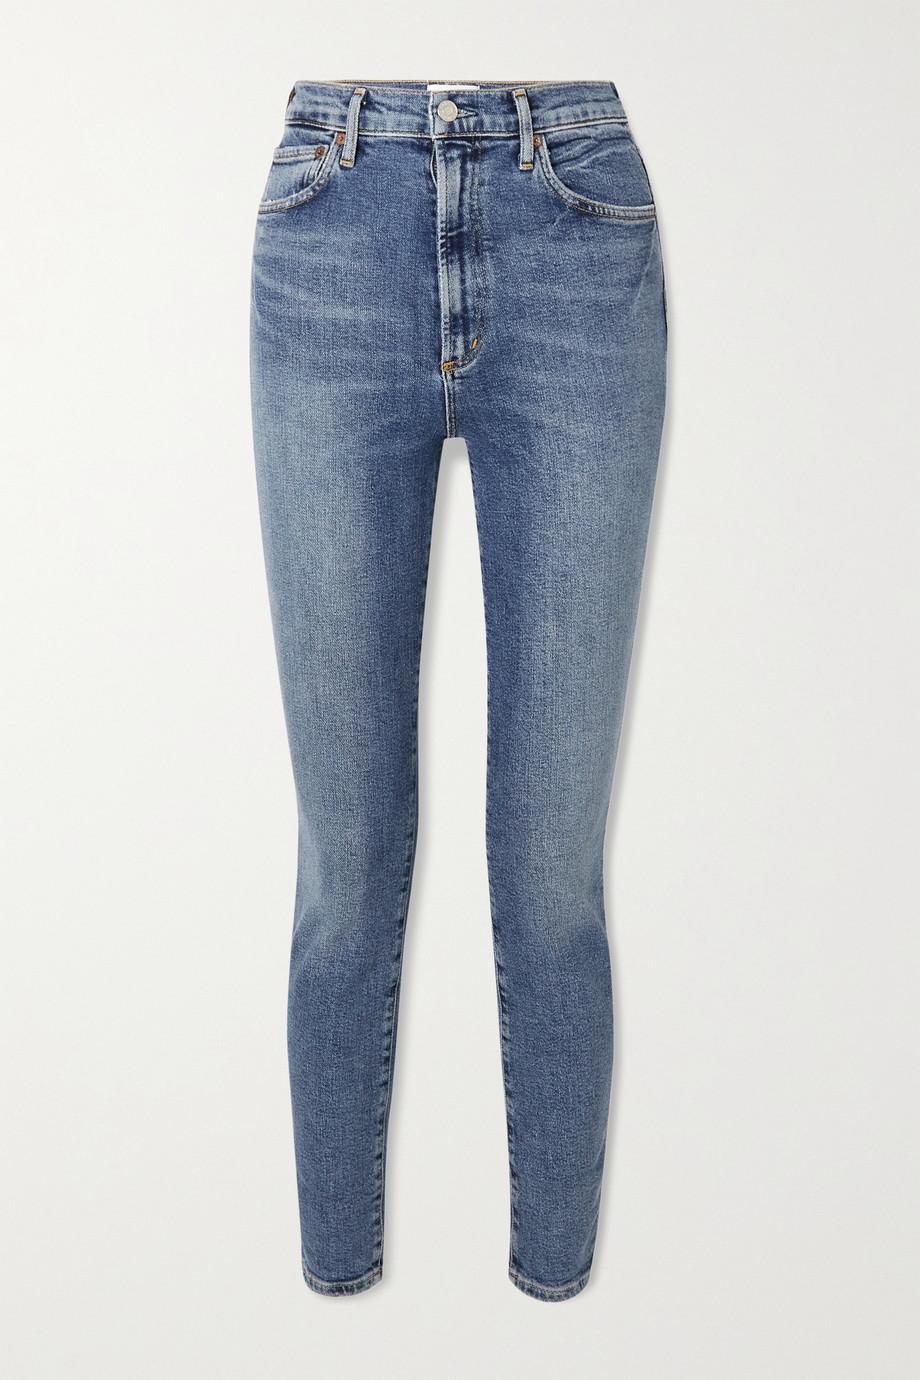 AGOLDE + NET SUSTAIN Pinched Waist hoch sitzende Skinny Jeans